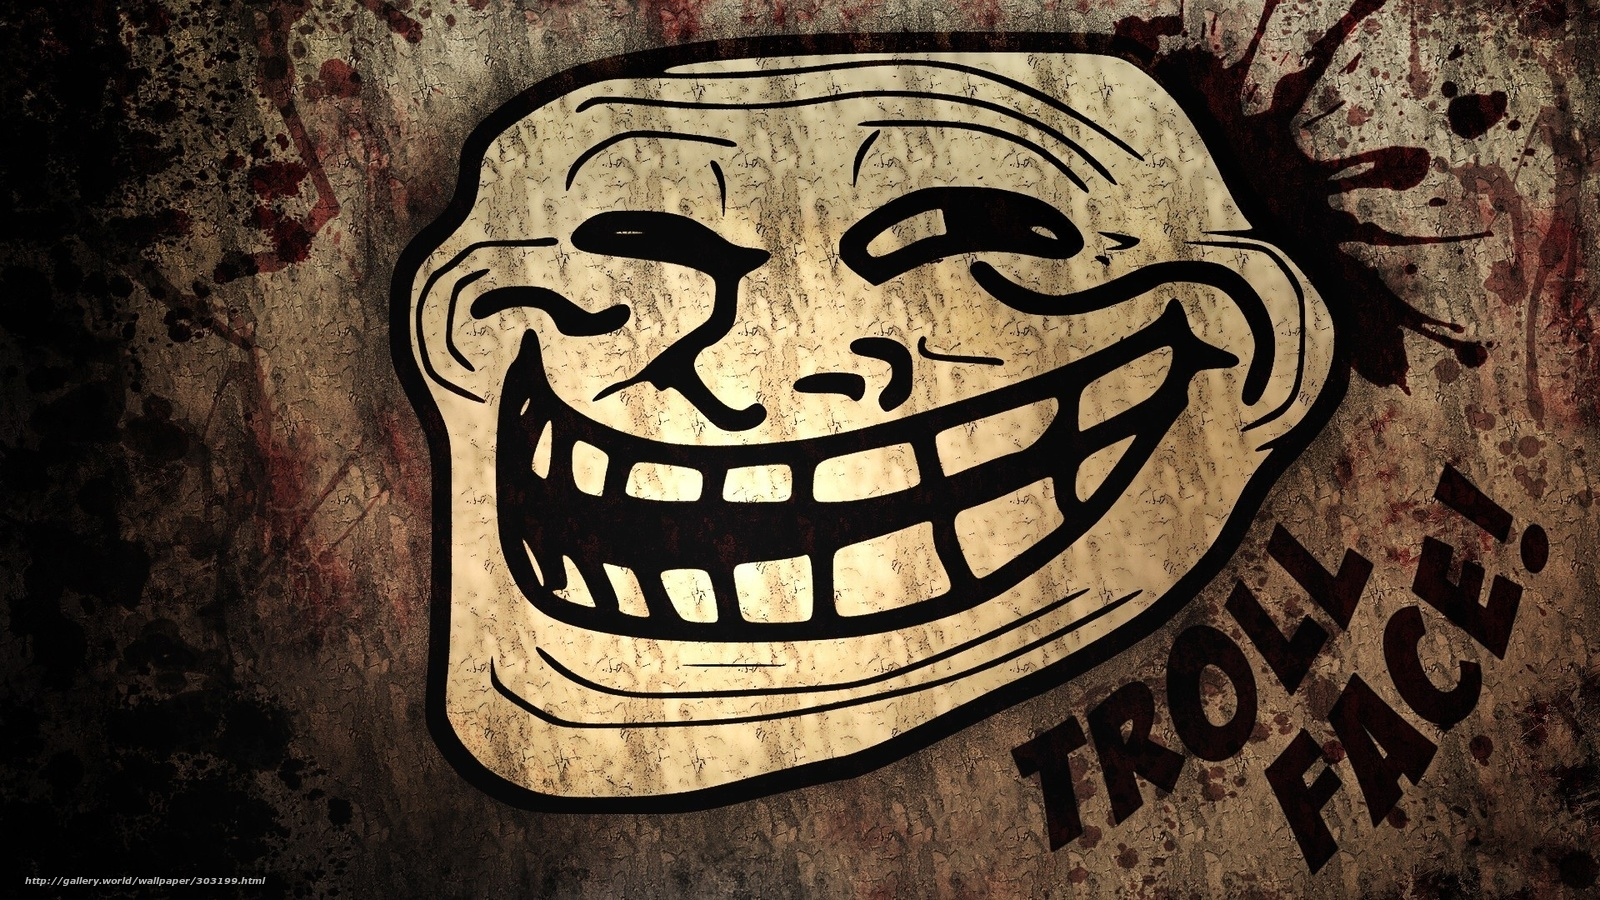 http://st.gdefon.ru/wallpapers_original/wallpapers/303199_trollface_-trolling_-troll_1920x1080_(www.GdeFon.ru).jpg